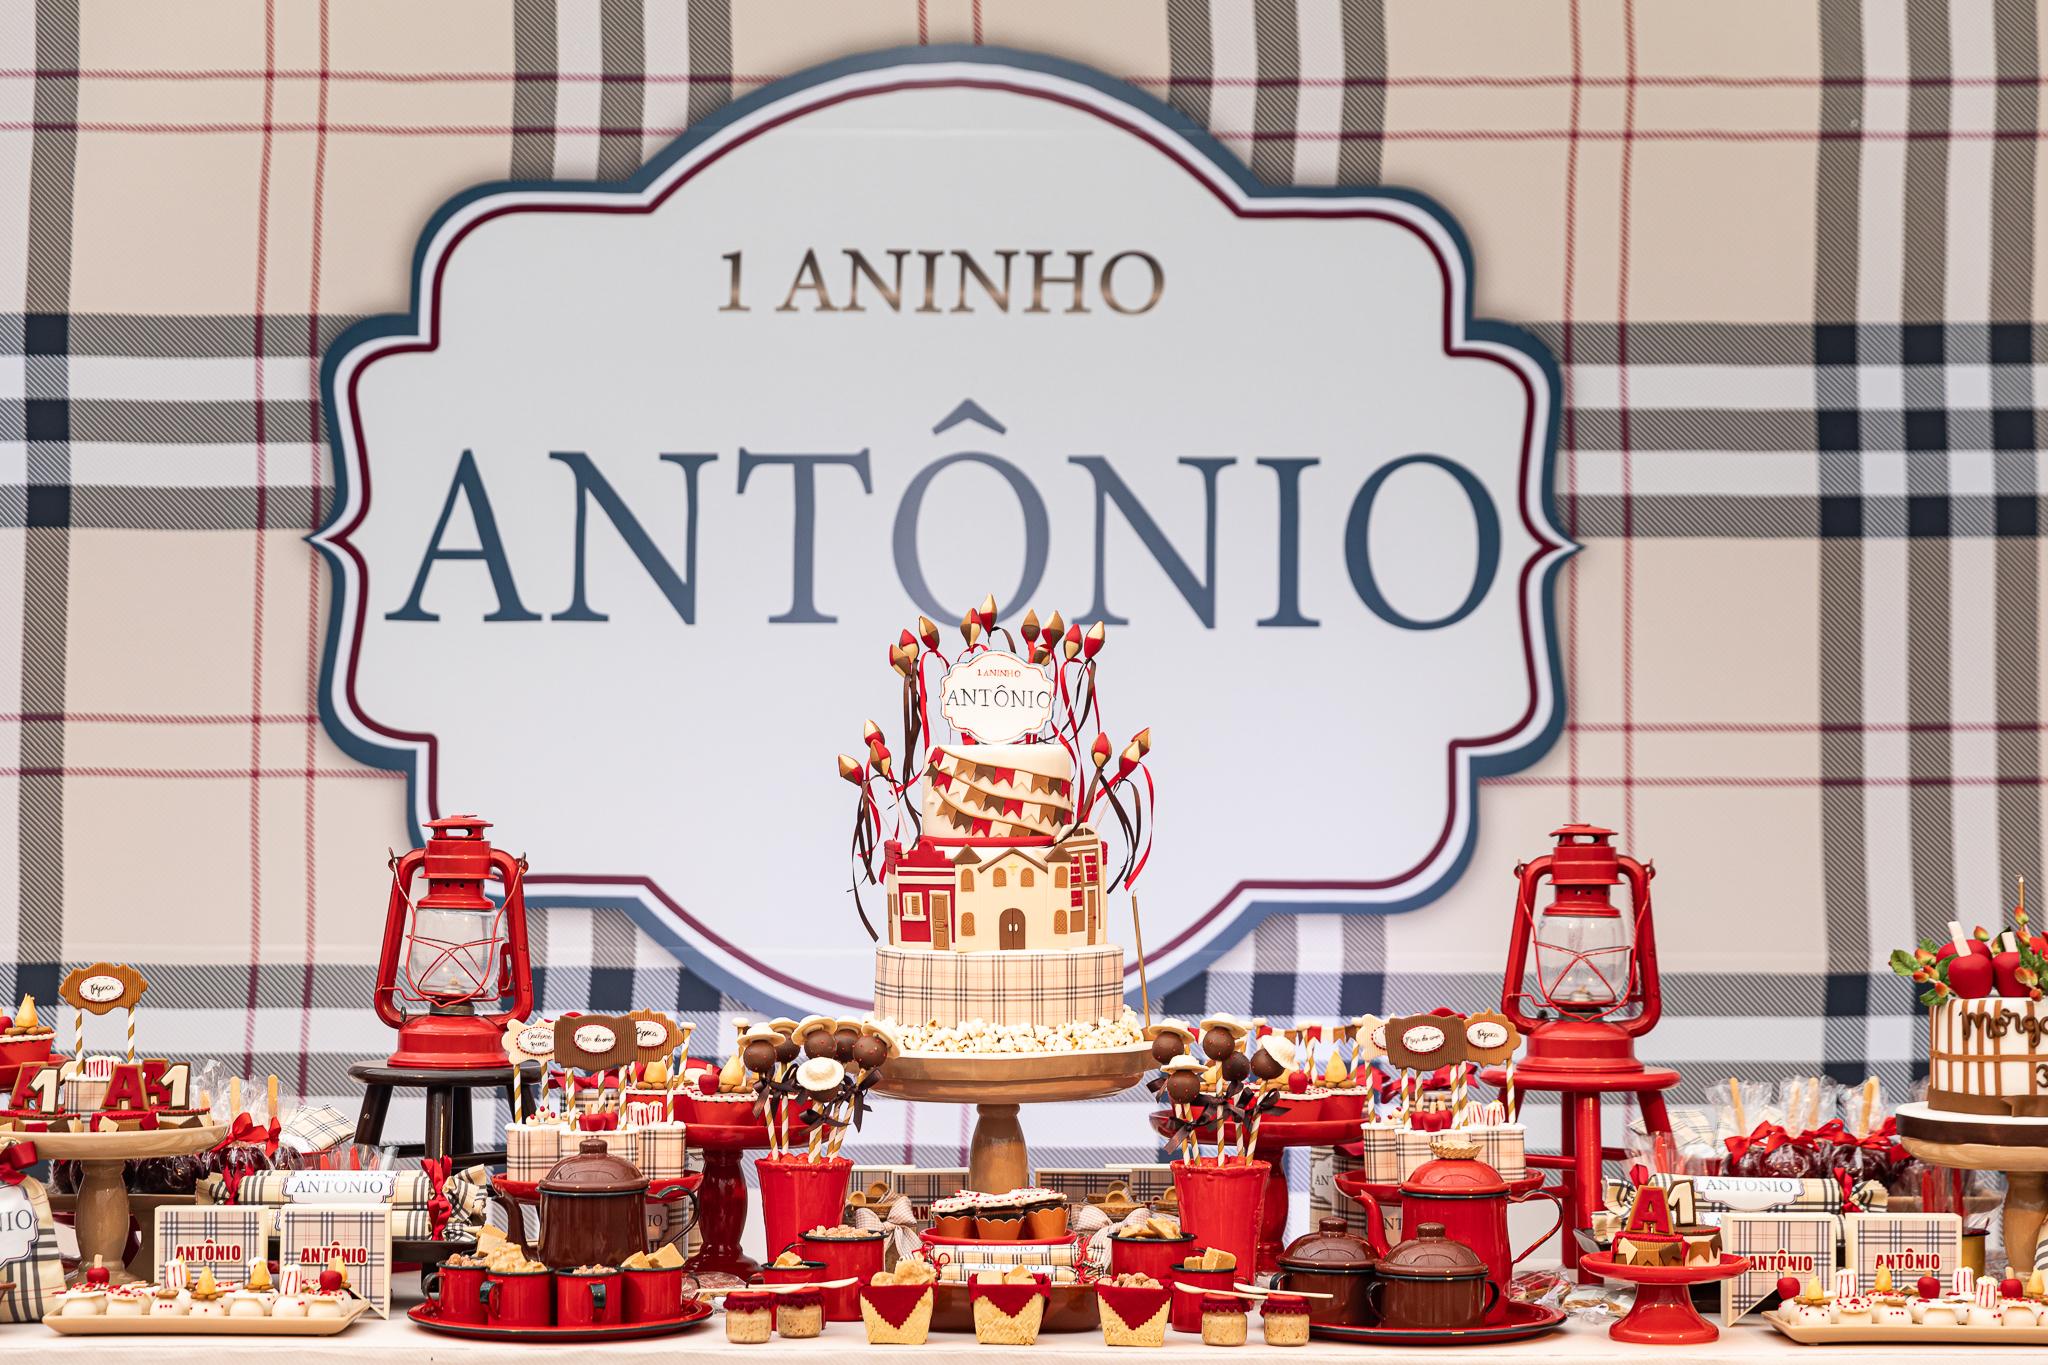 27062021-1stAntonio-0010